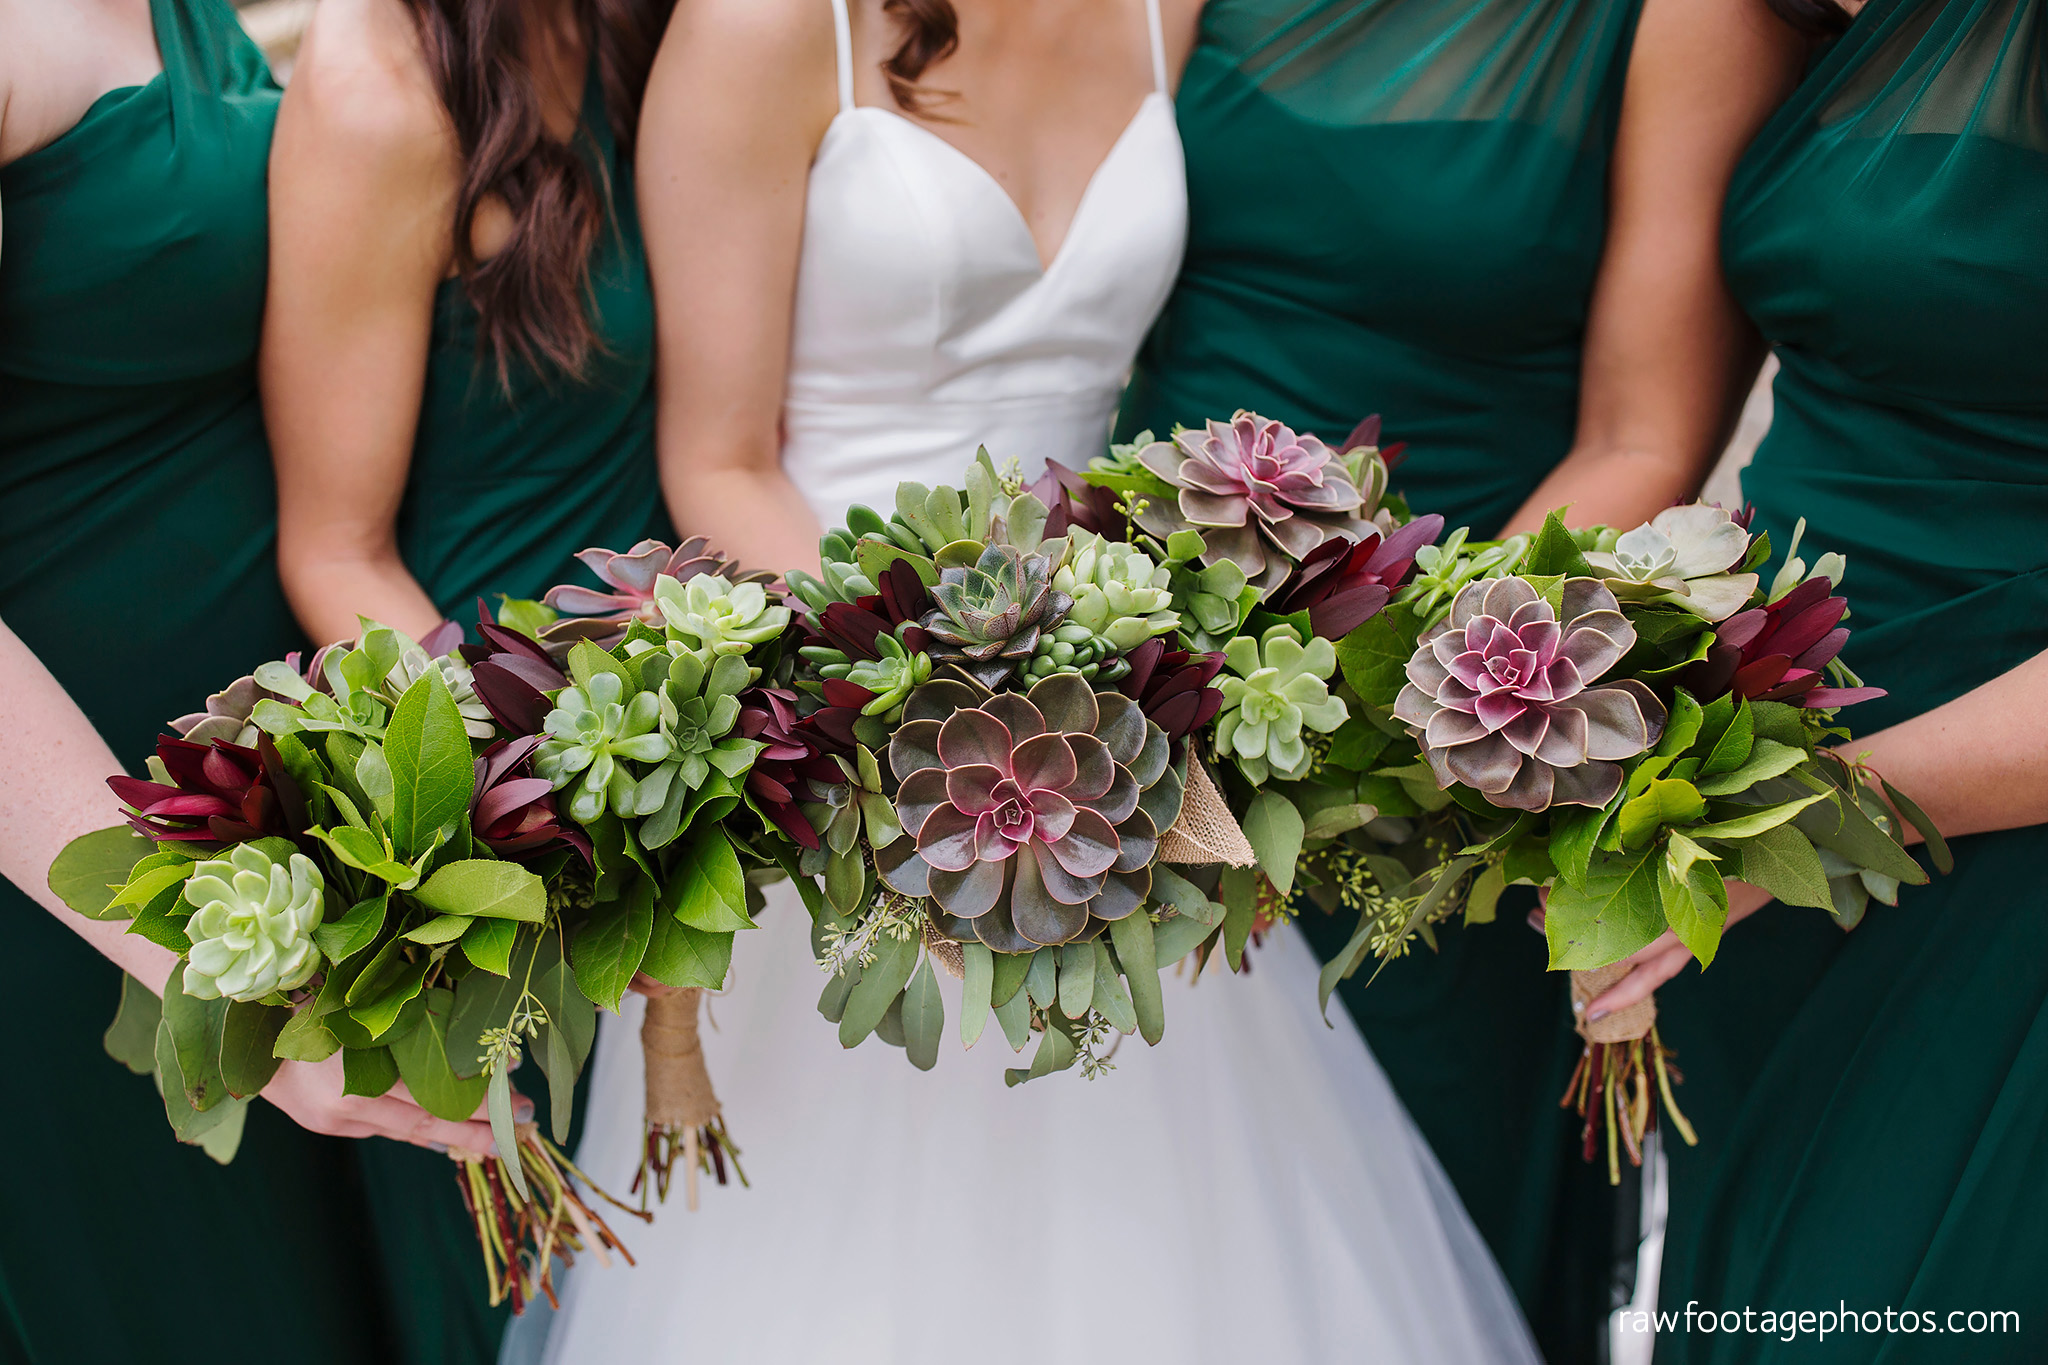 london_ontario_wedding_photographer-civic_gardens-springbank_park-succulent_bouquet-fall_wedding-bridge-raw_footage_photography048.jpg